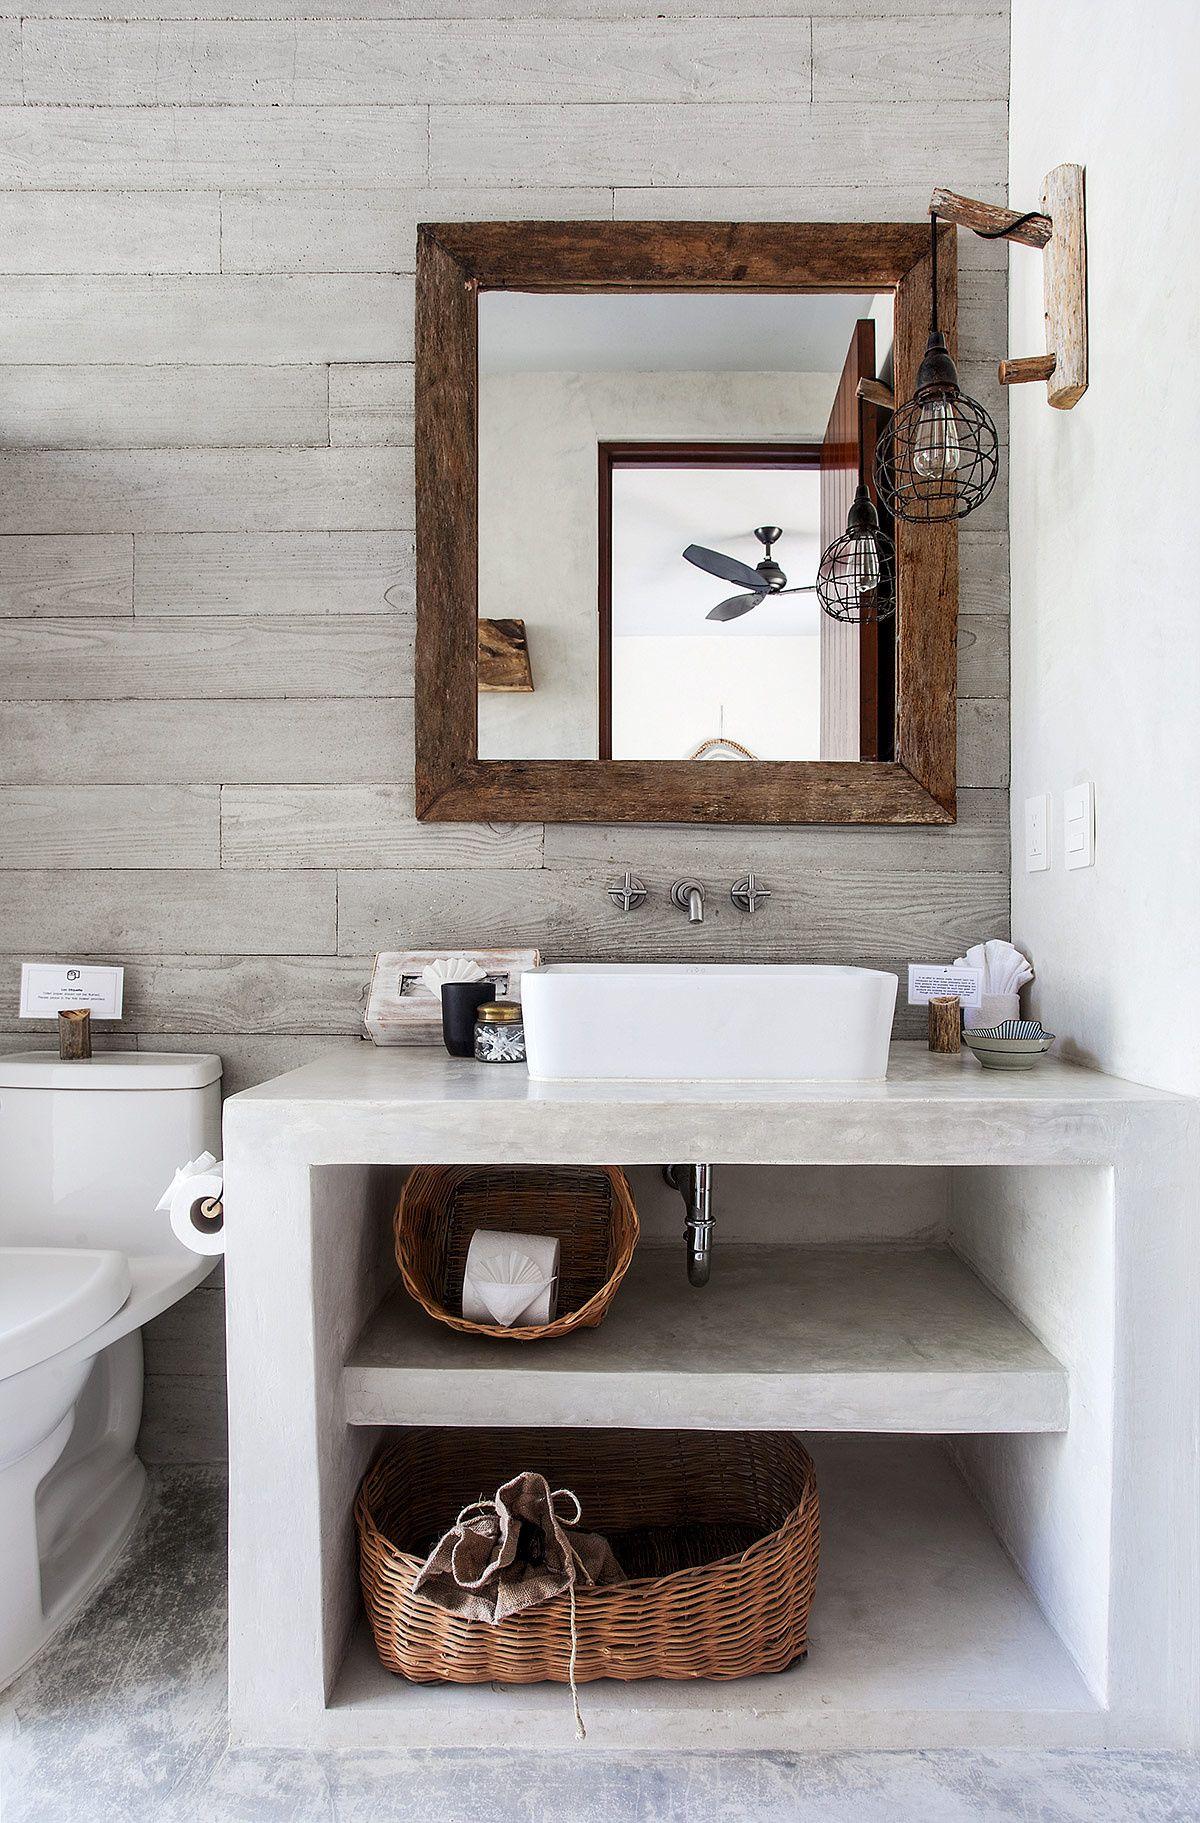 Hotel sanar tulum banheiros lavabos e r stico for Mueble lavabo rustico